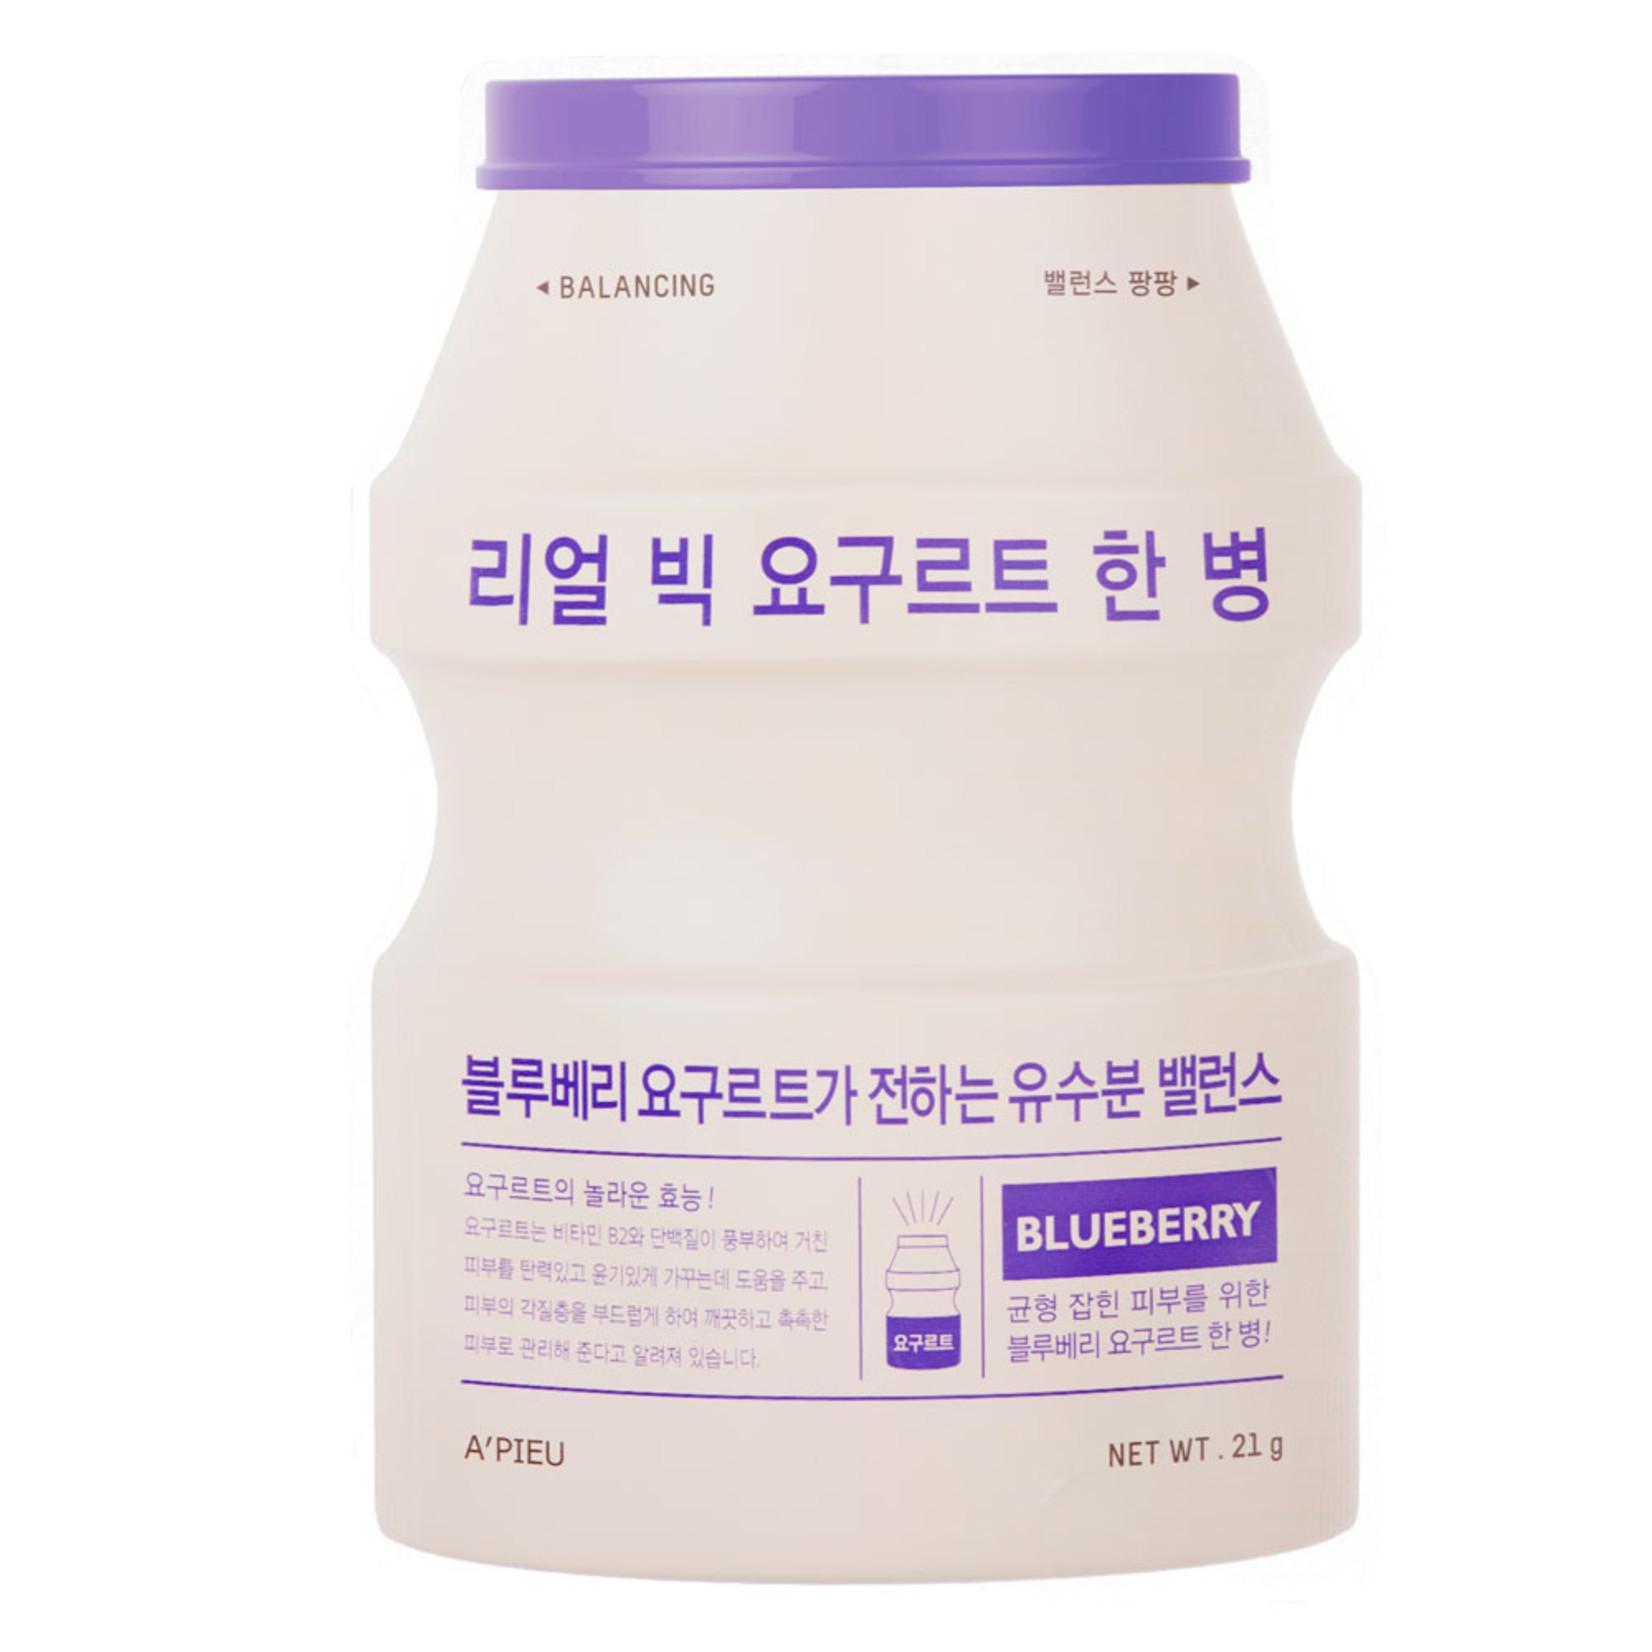 A'pieu Real Big Yoghurt Blueberry Sheet Mask 10pcs